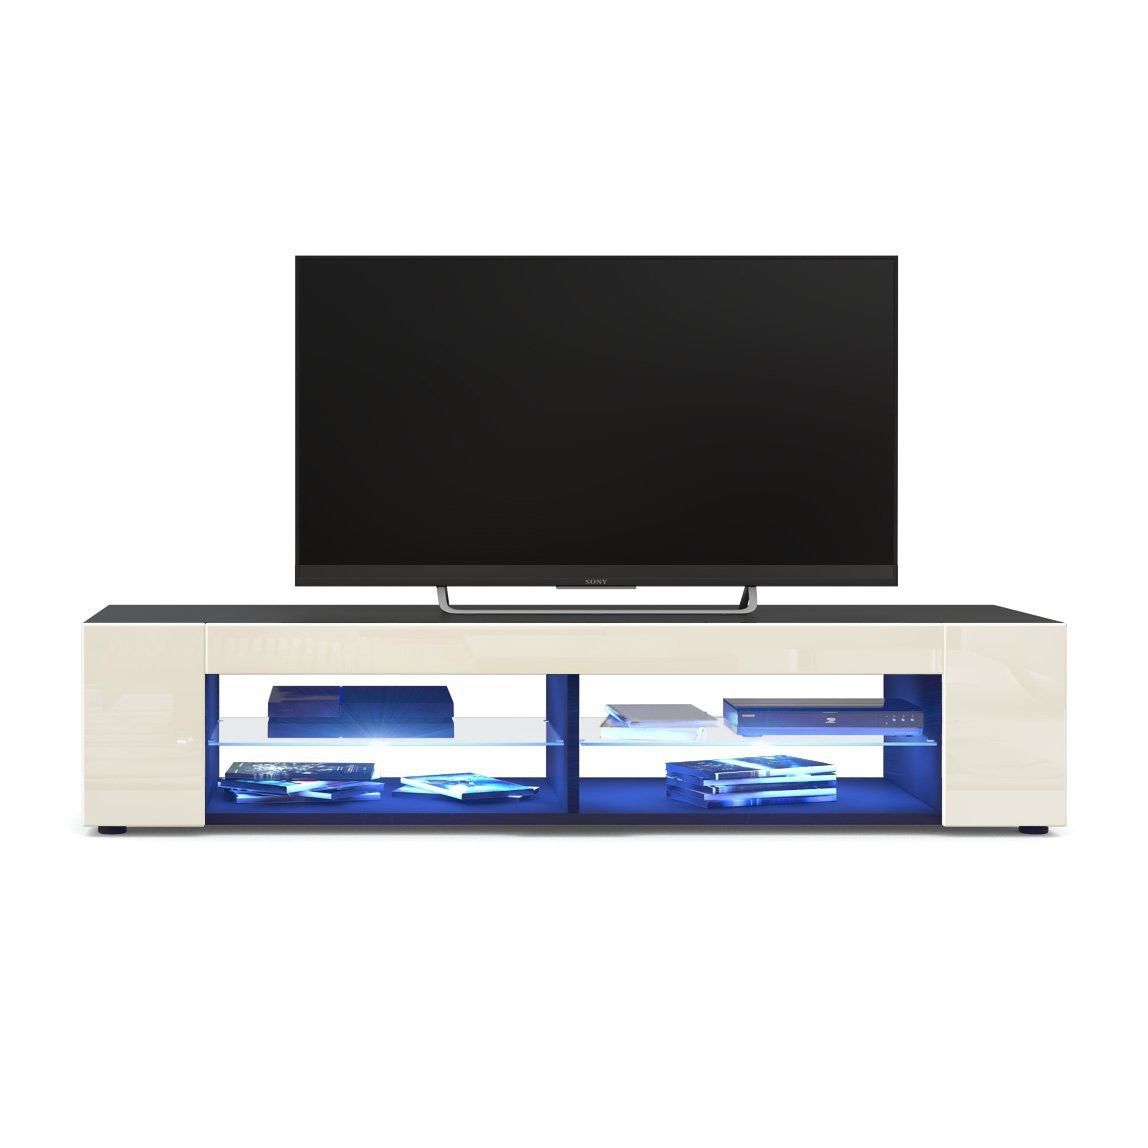 meuble tv corps noir mat fa ades en cr me laqu es led bleu. Black Bedroom Furniture Sets. Home Design Ideas